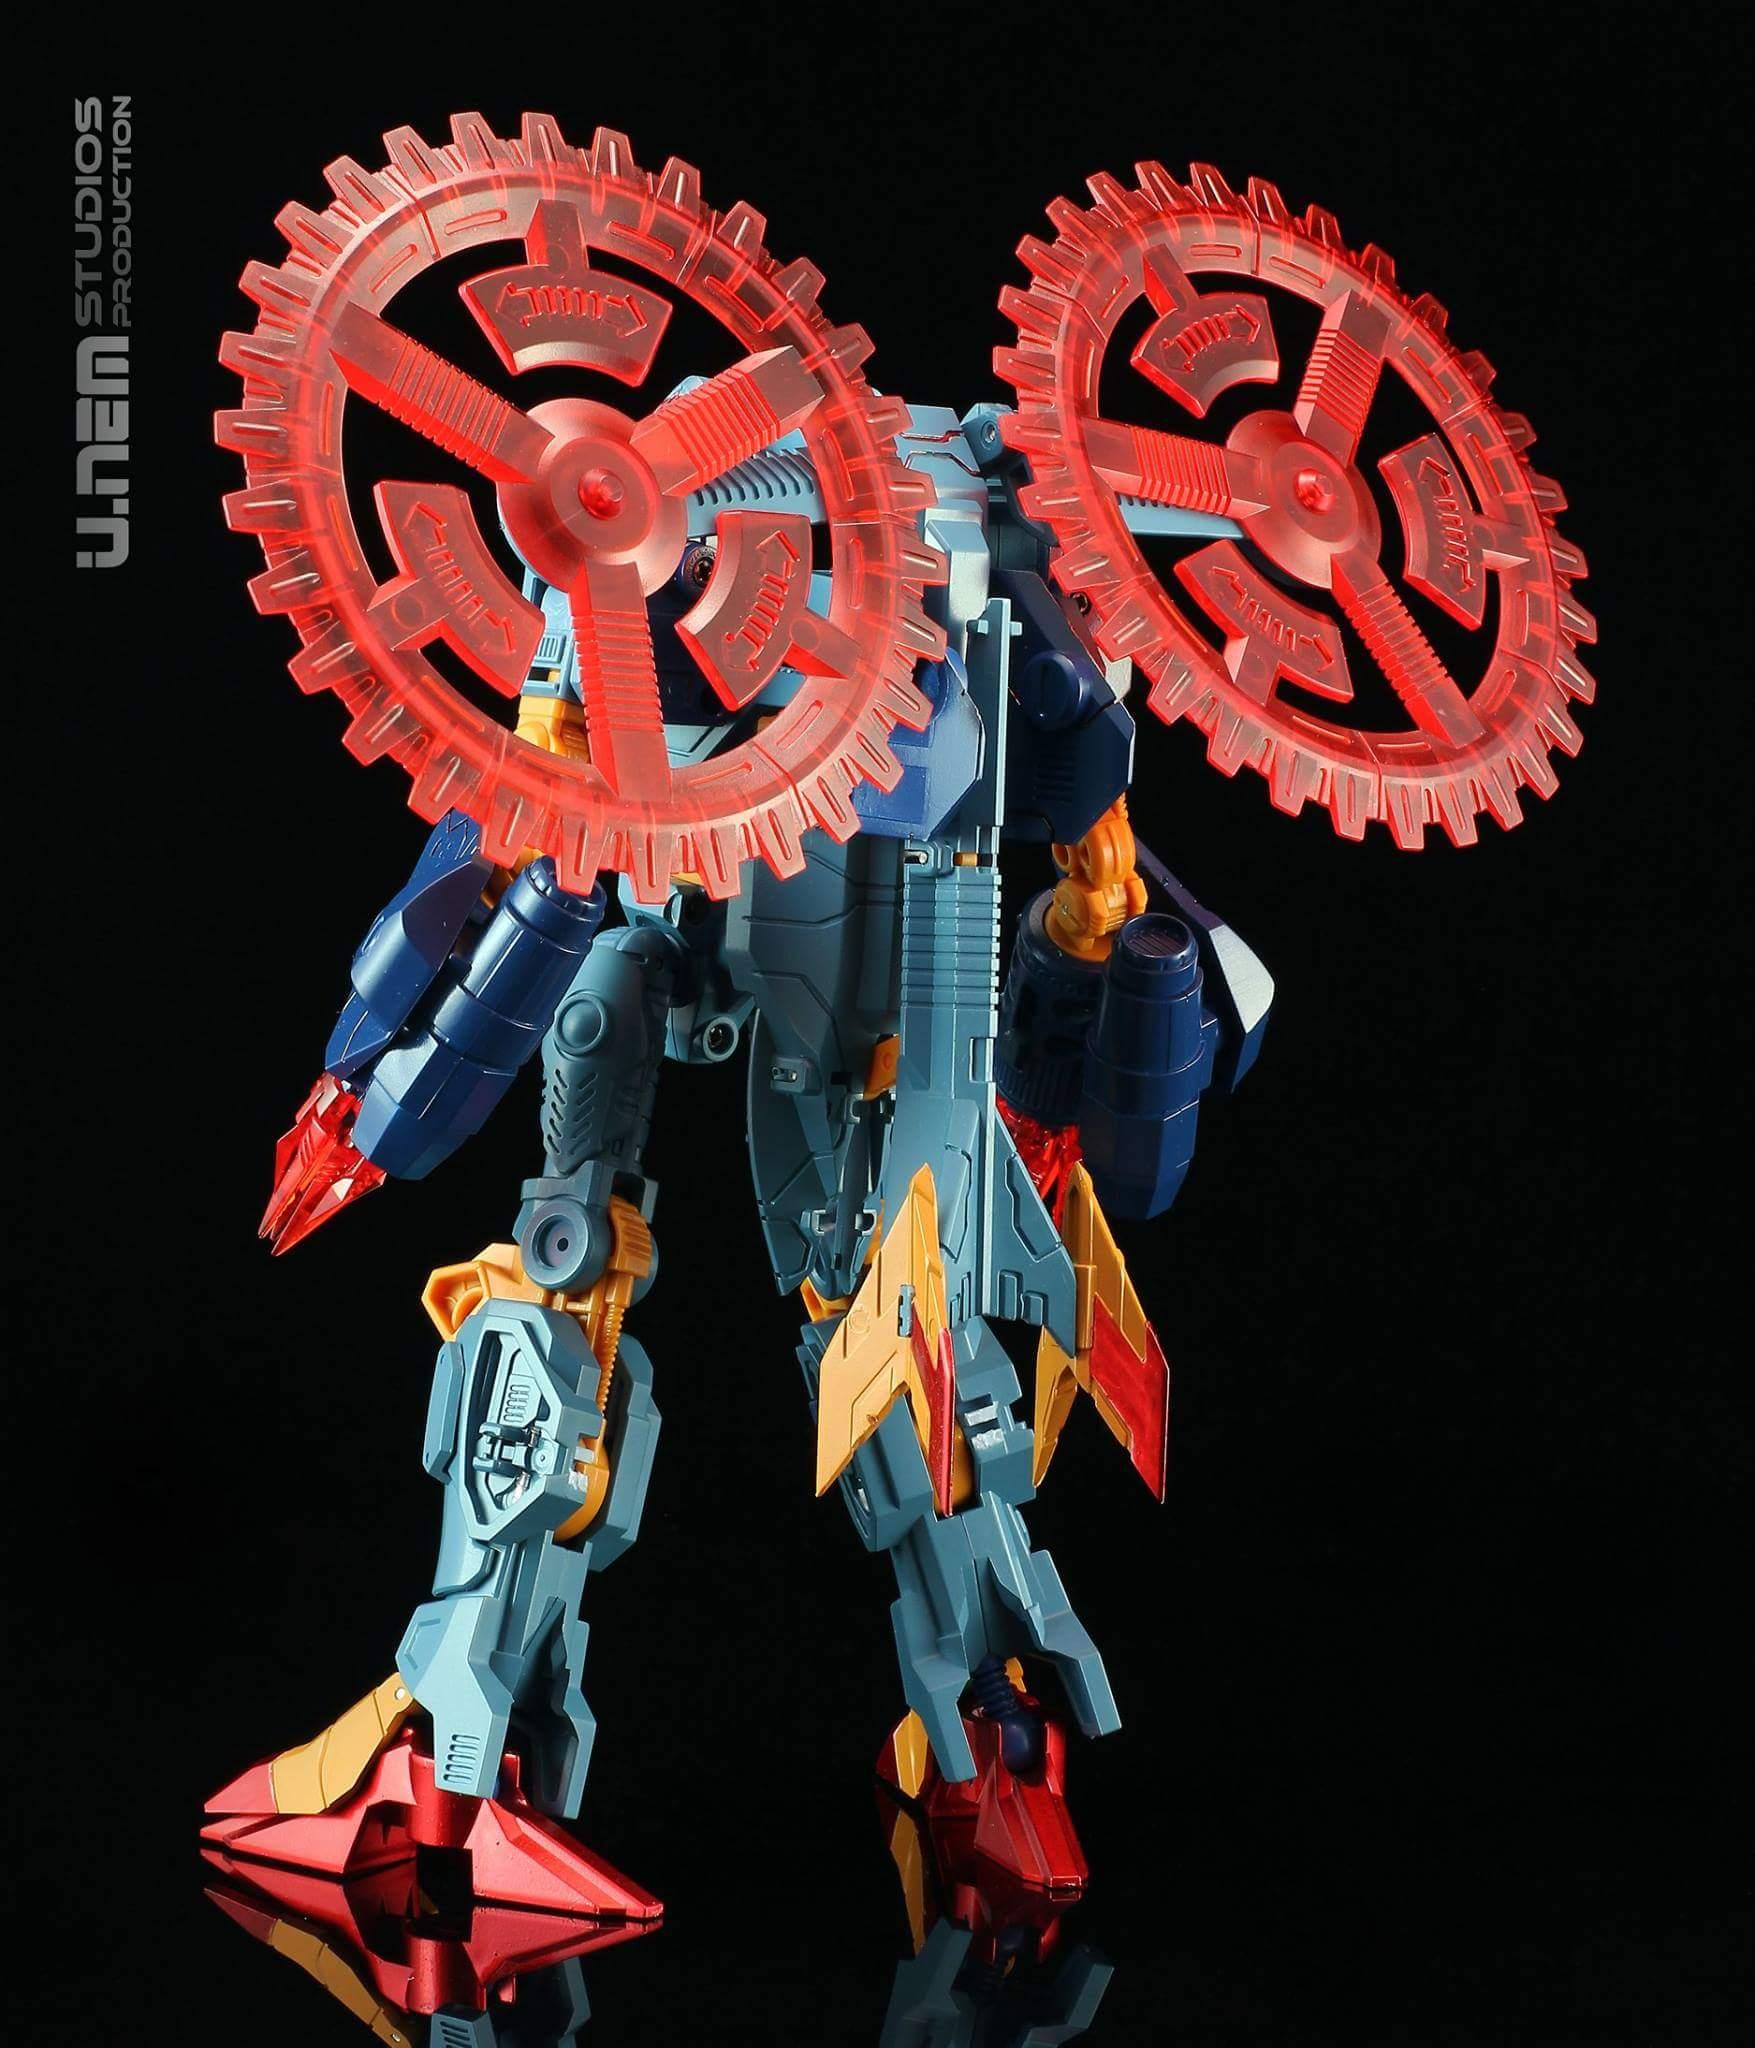 [Mastermind Creations] Produit Tiers - Gamme R - Basé sur Beast Machines ZhKPgEWe